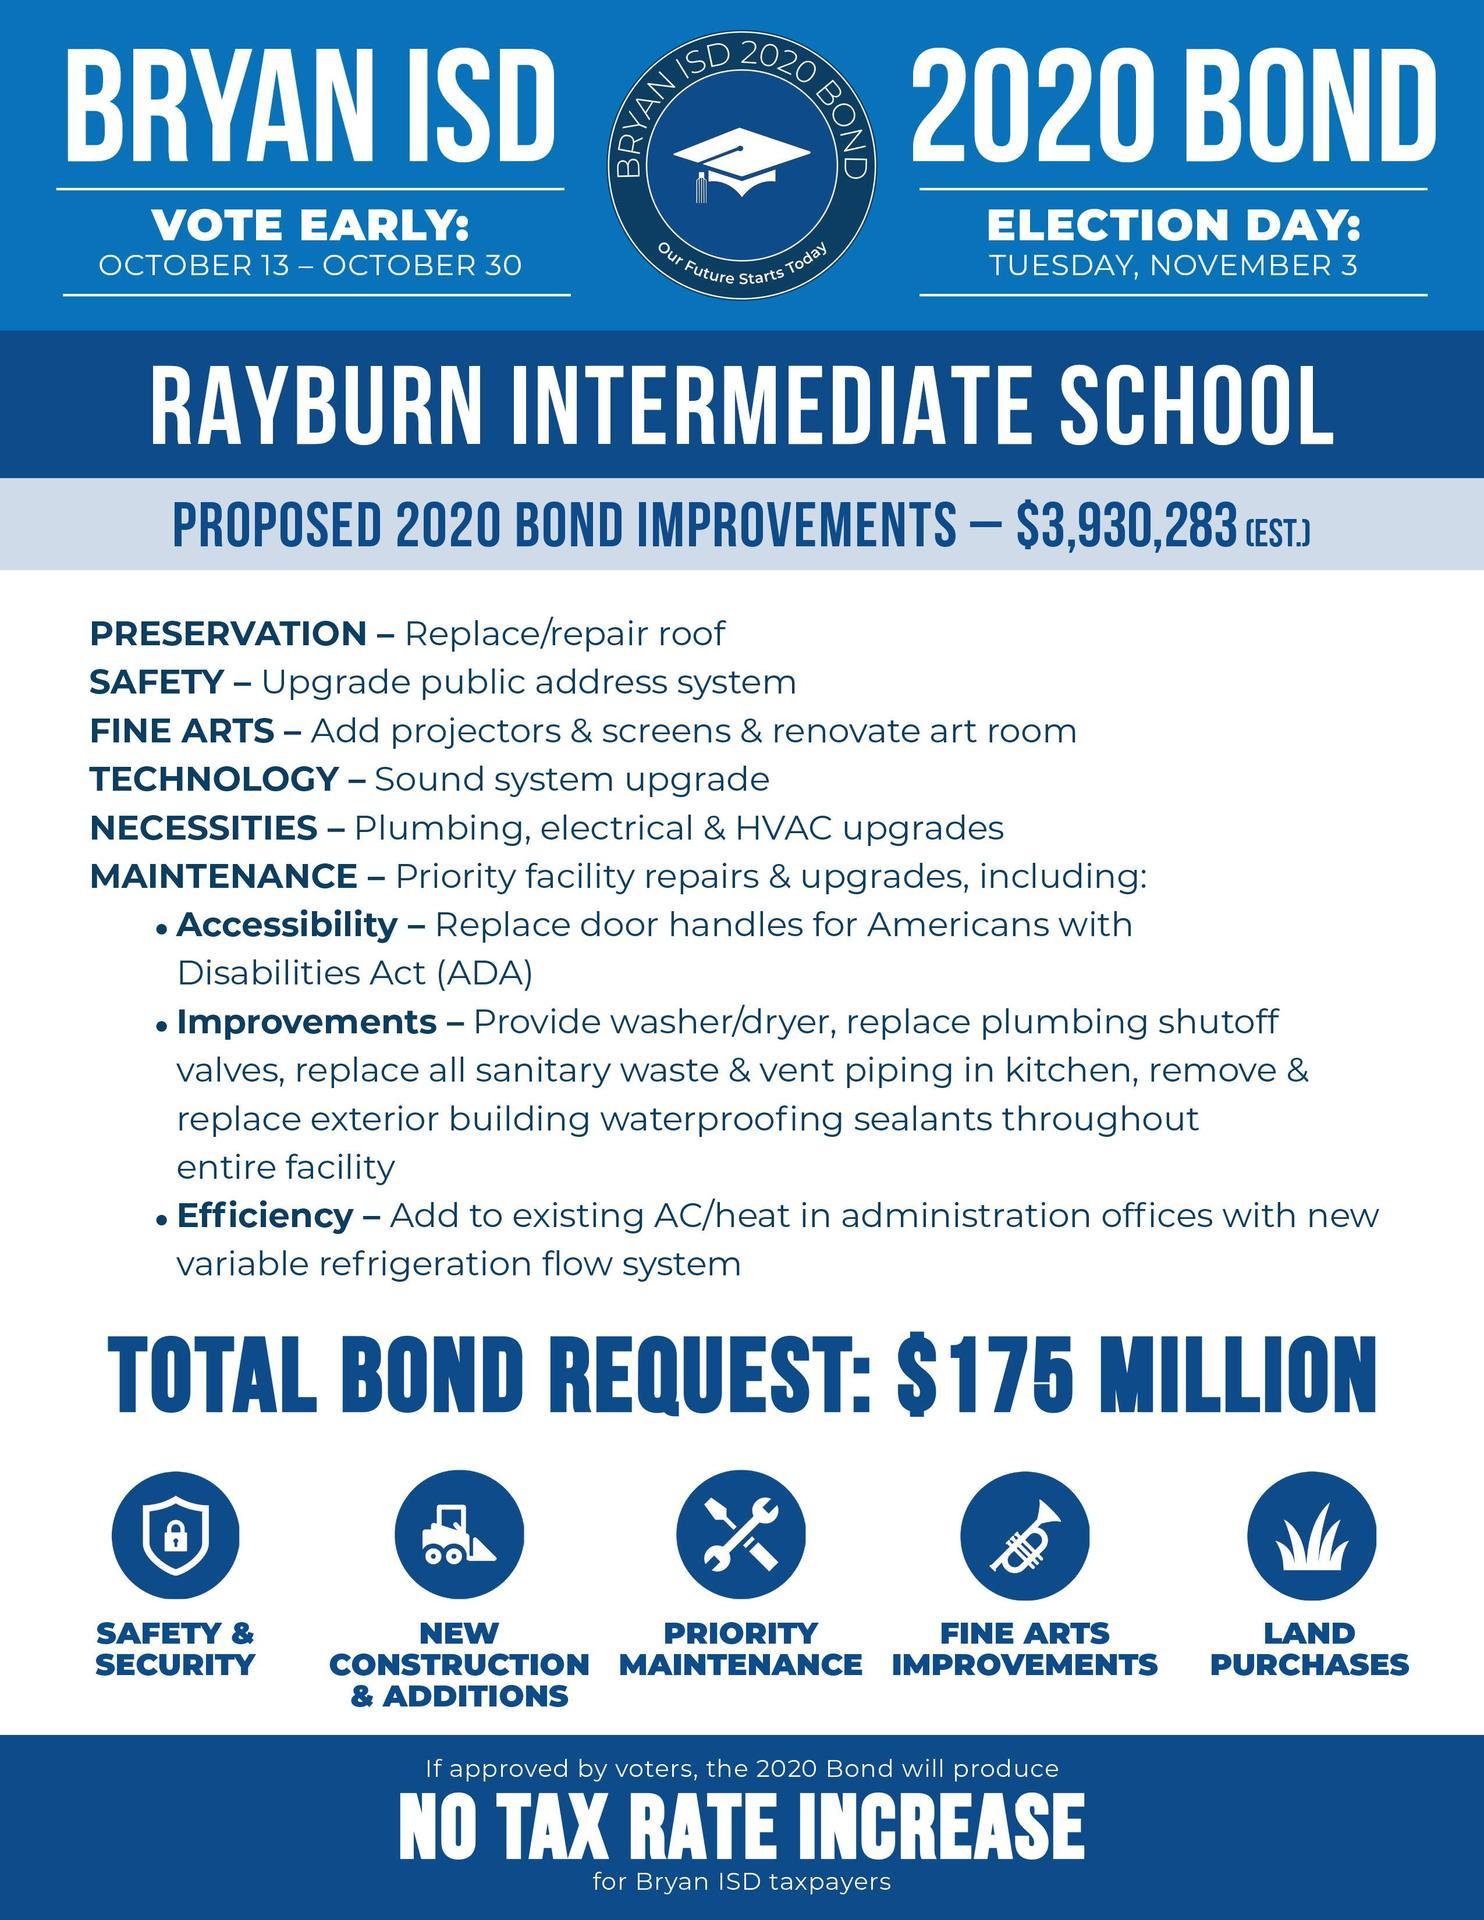 Rayburn Intermediate School Bond Information